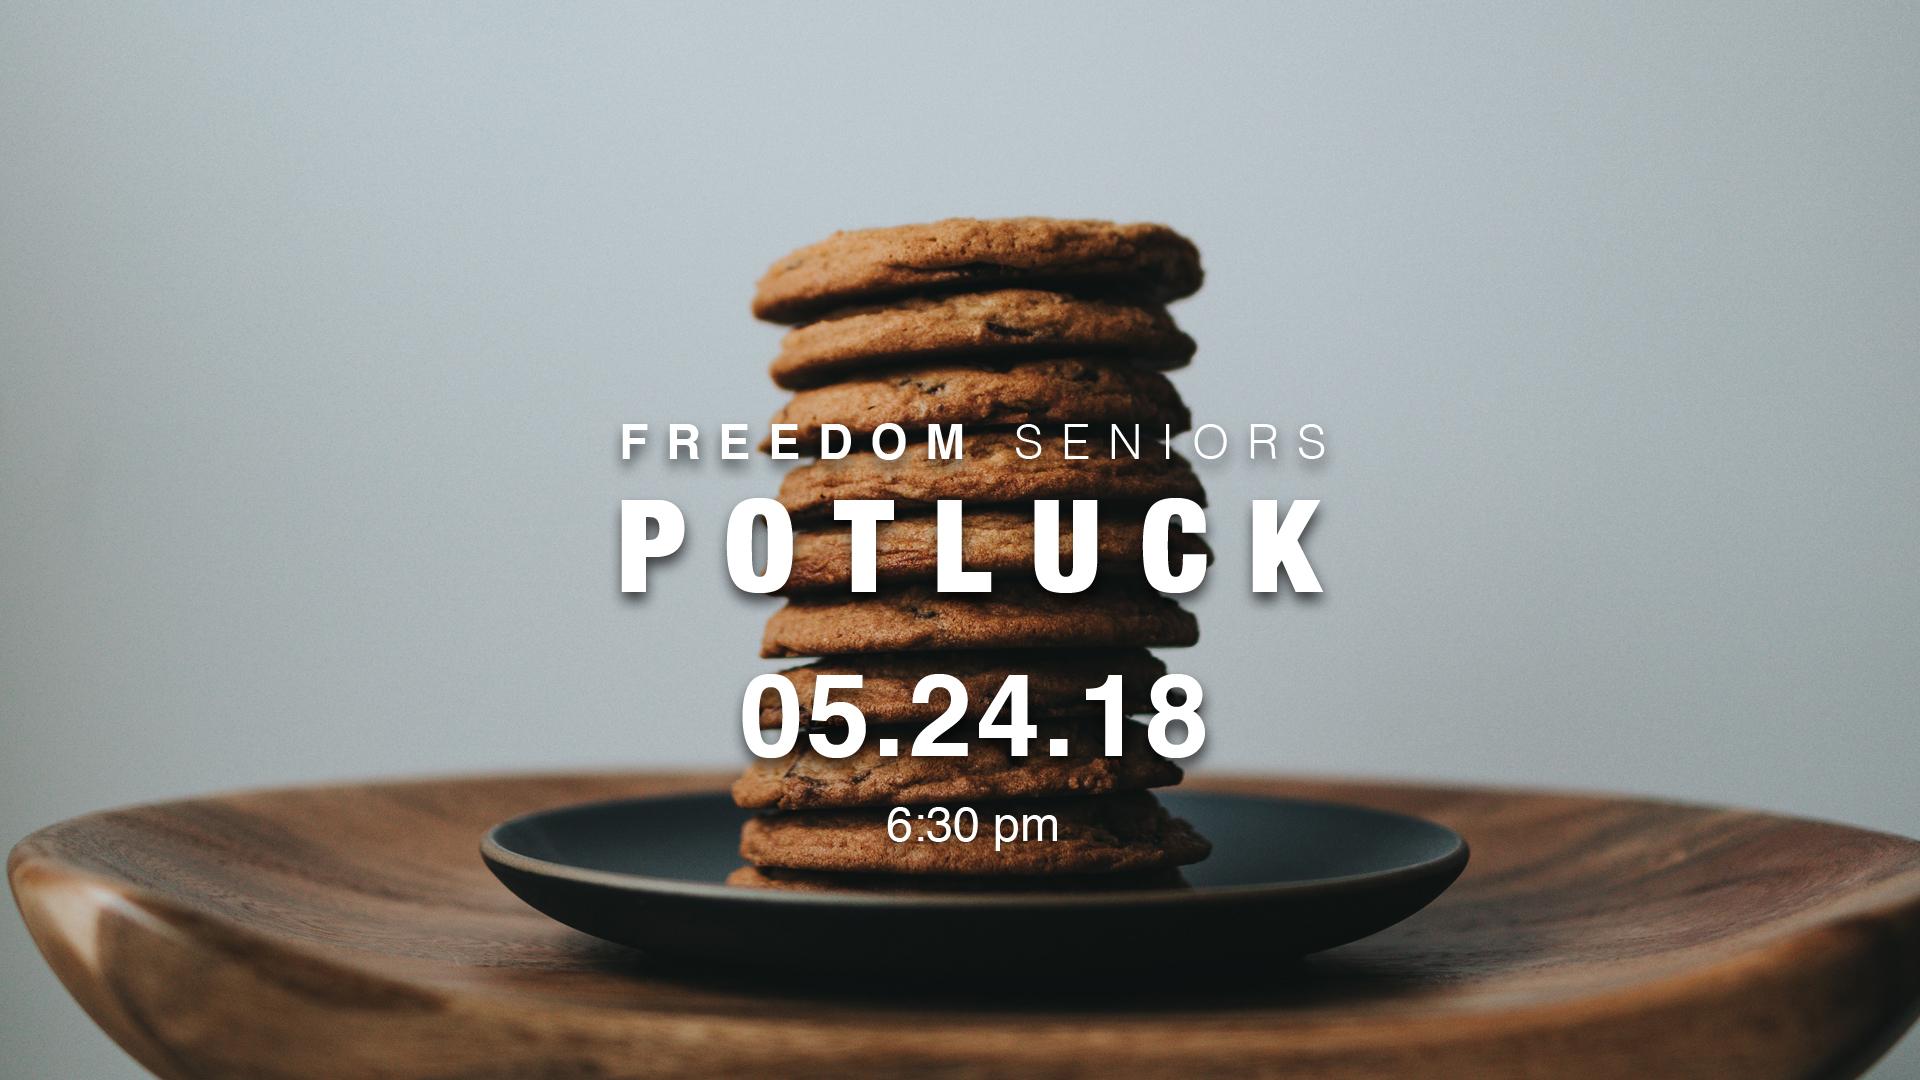 Freedom-Senior-Potluck-May (1).jpg